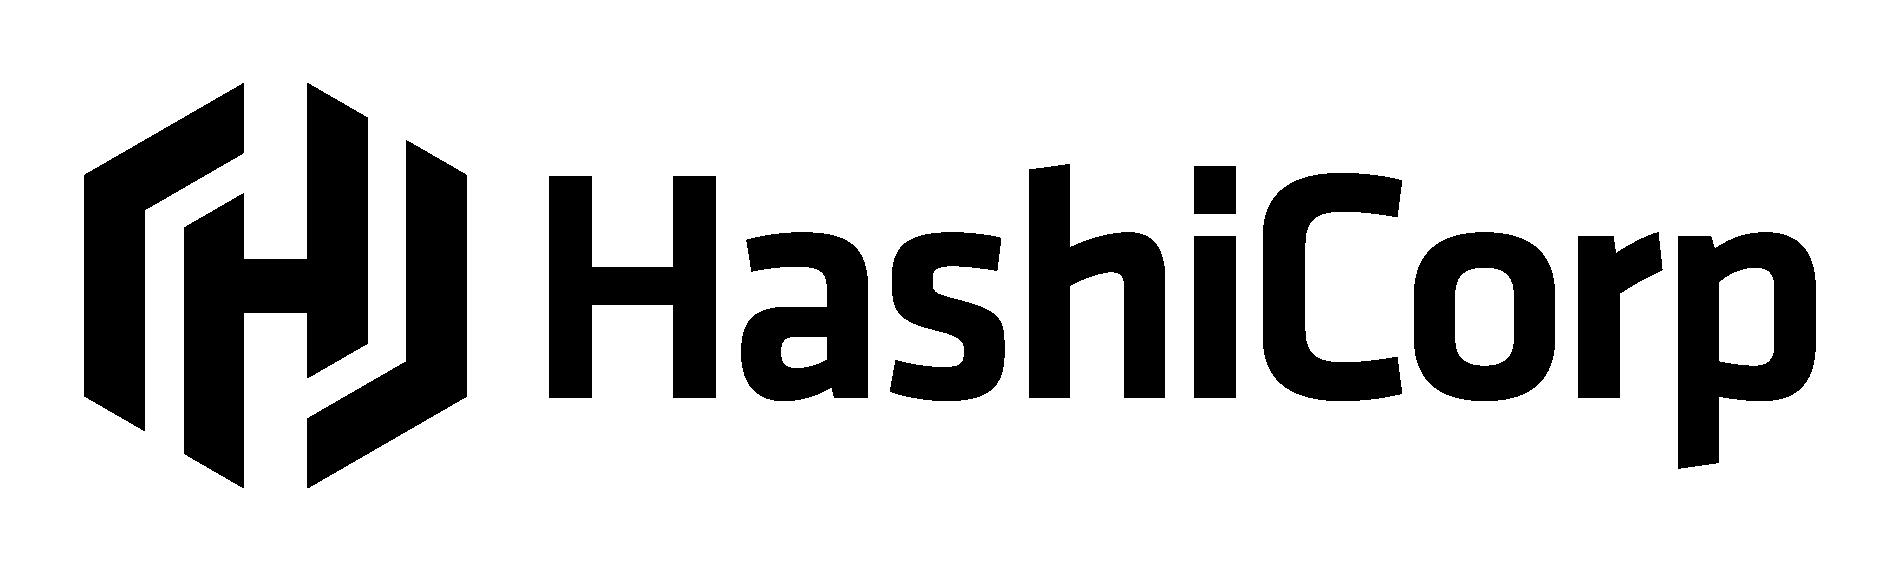 HashiCorp_PrimaryLogo_Black_RGB.png